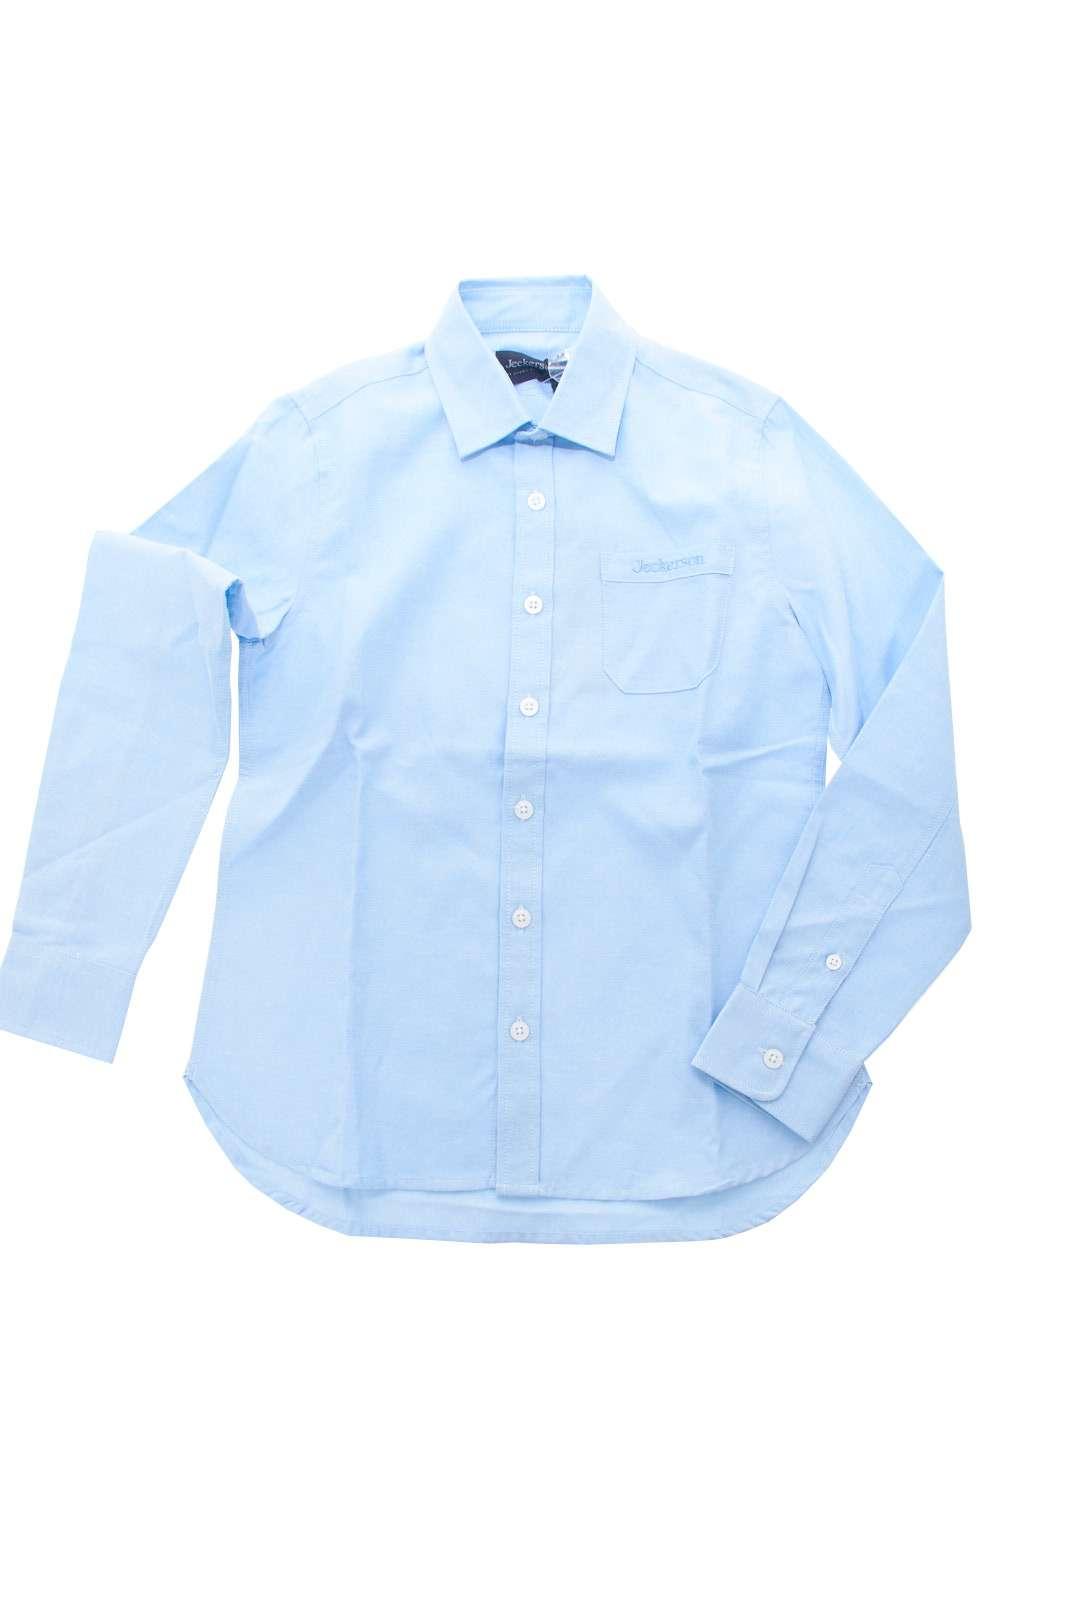 /media/catalog/product/a/i/PE-outlet_parmax-camicia-bambino-Jeckerson-J1332-A.jpg